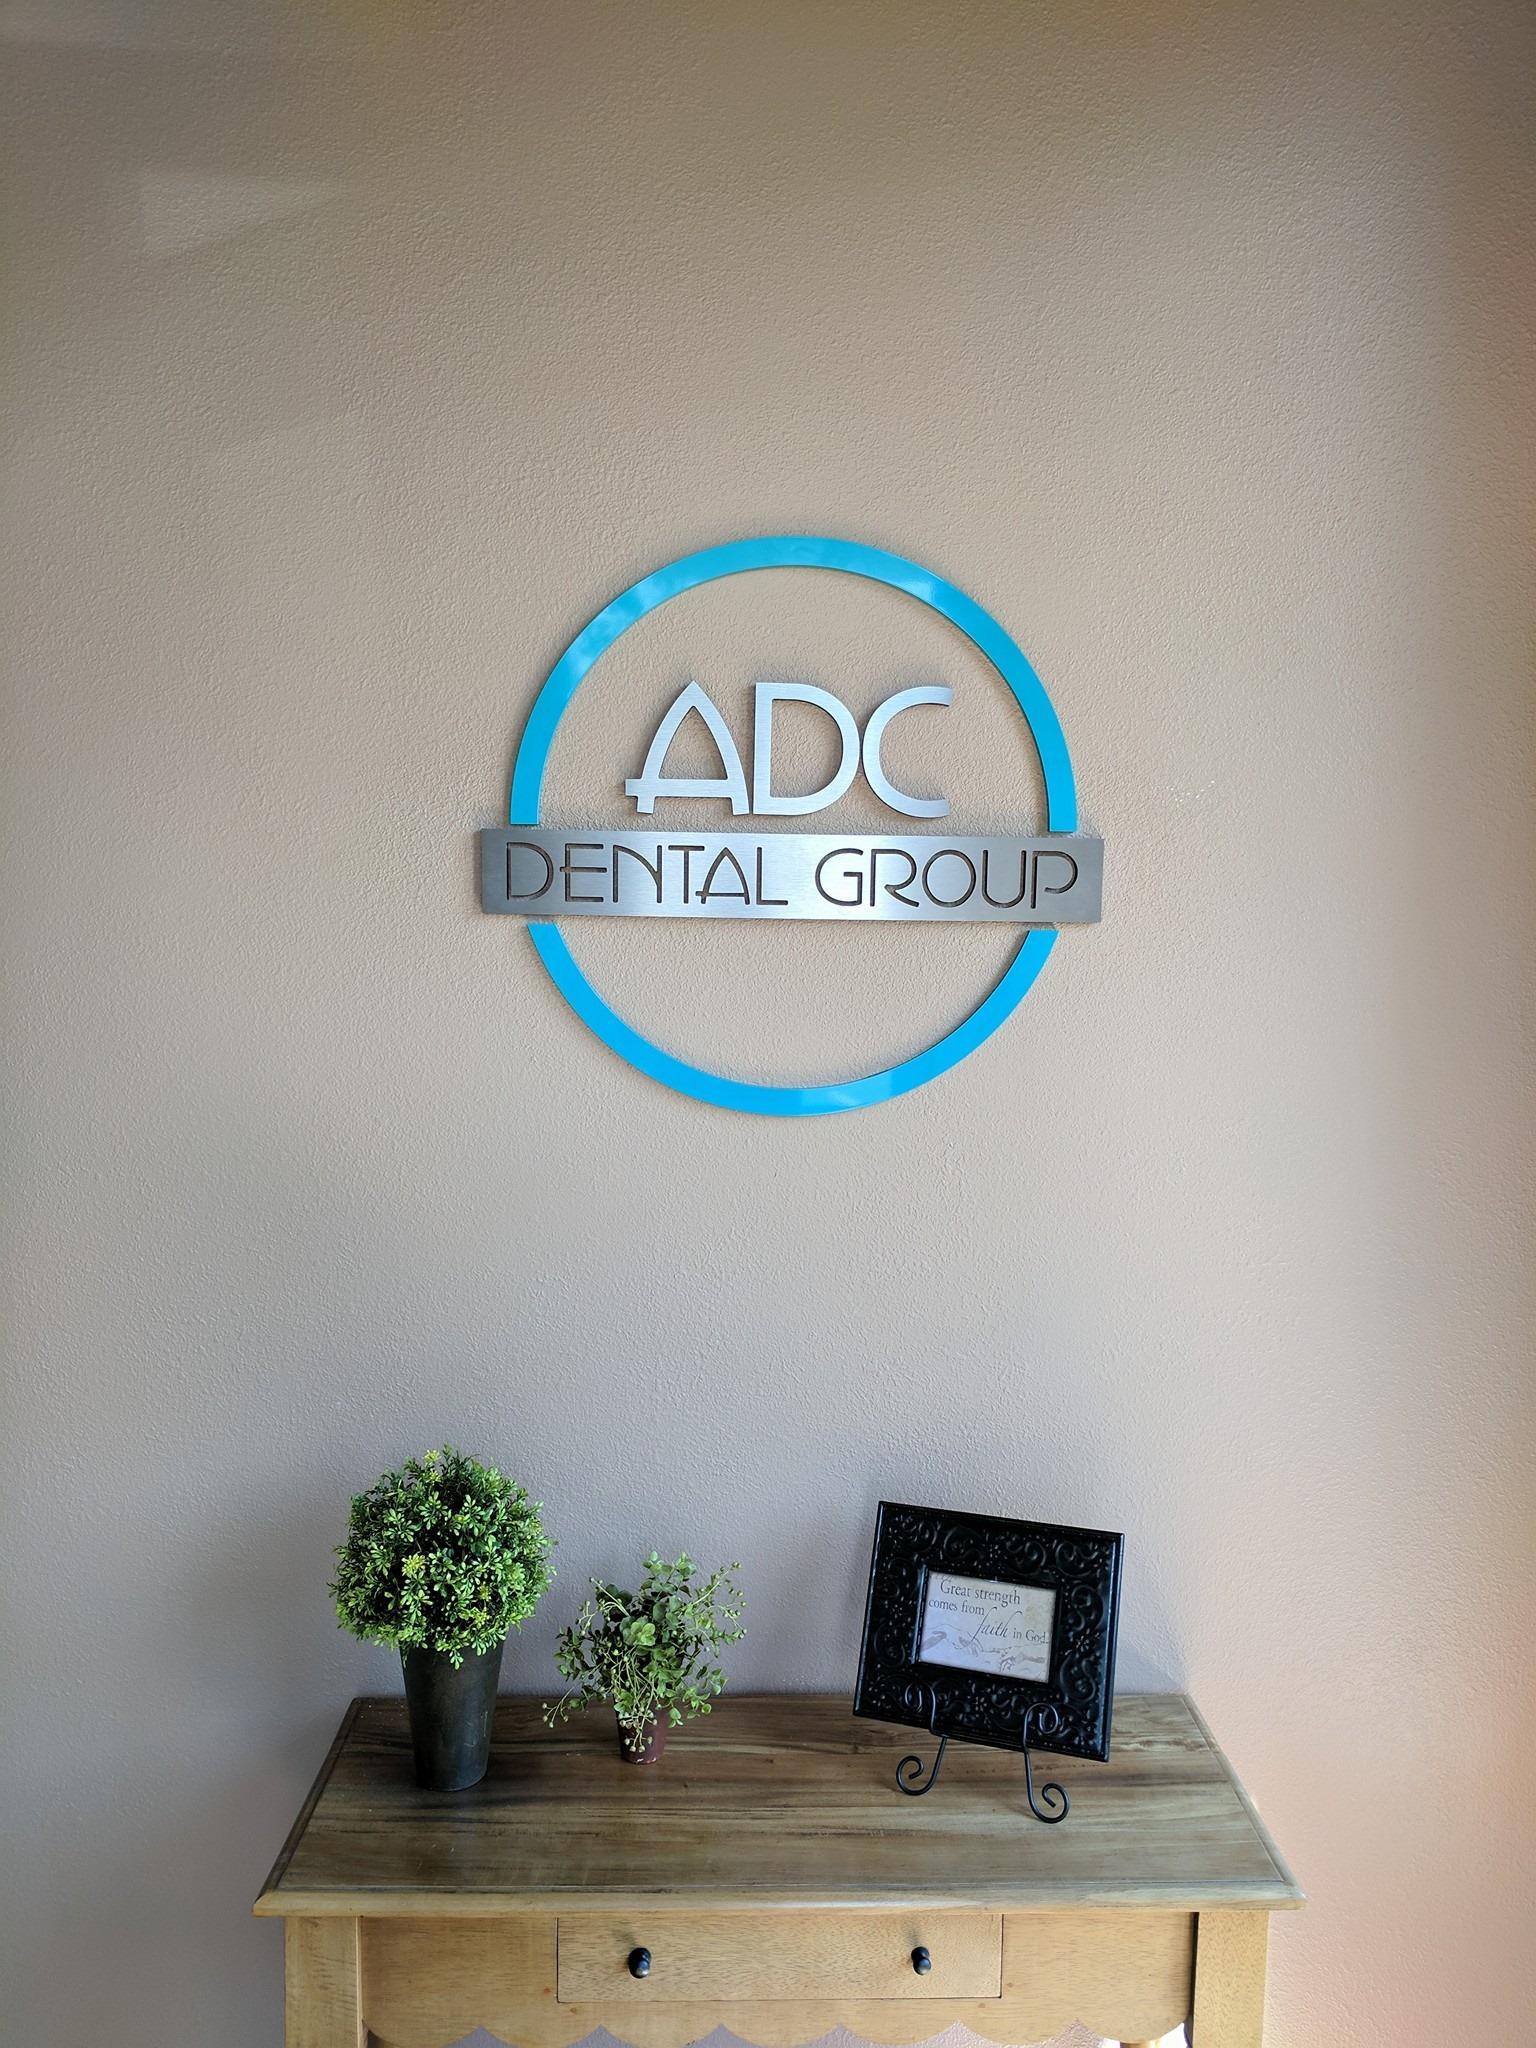 ADC Dental Group image 7